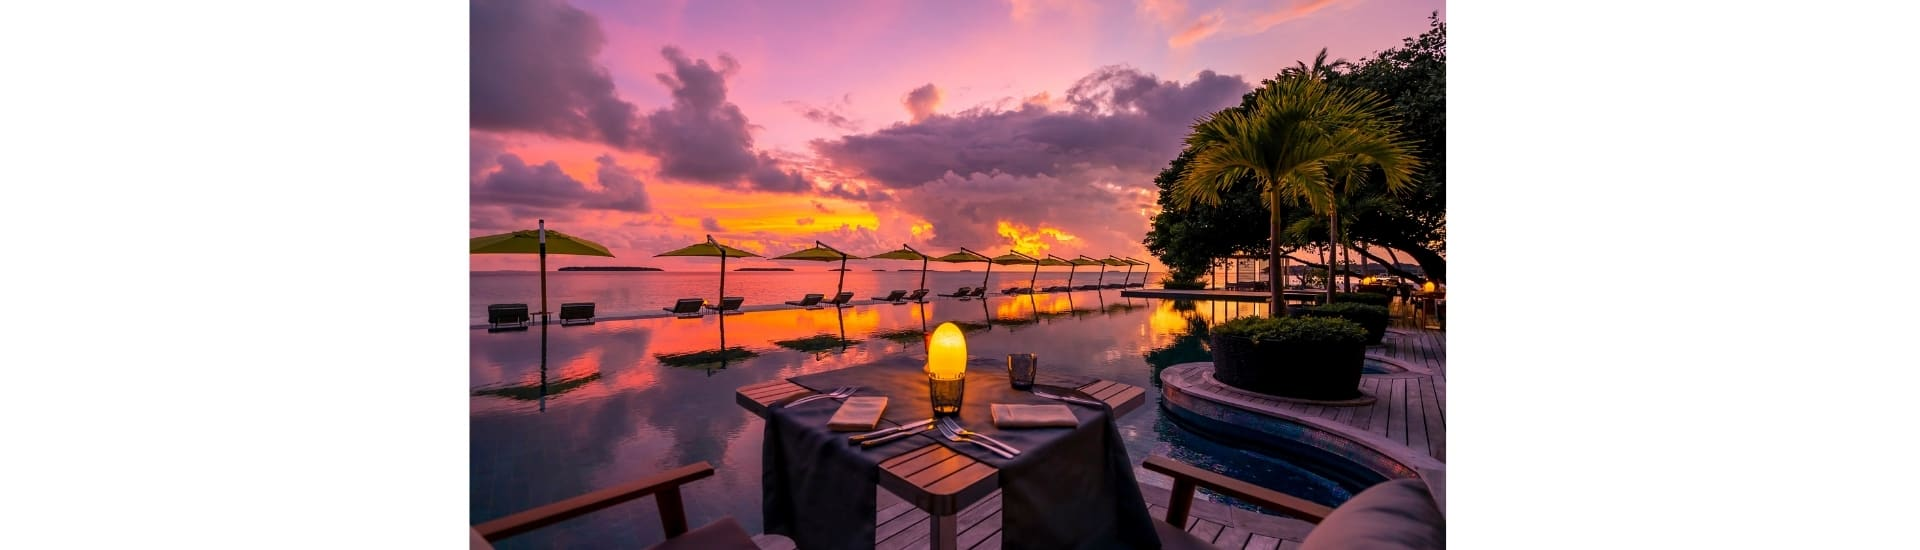 Anantara Kihavah Maldives Villas - Underwater Restaurant